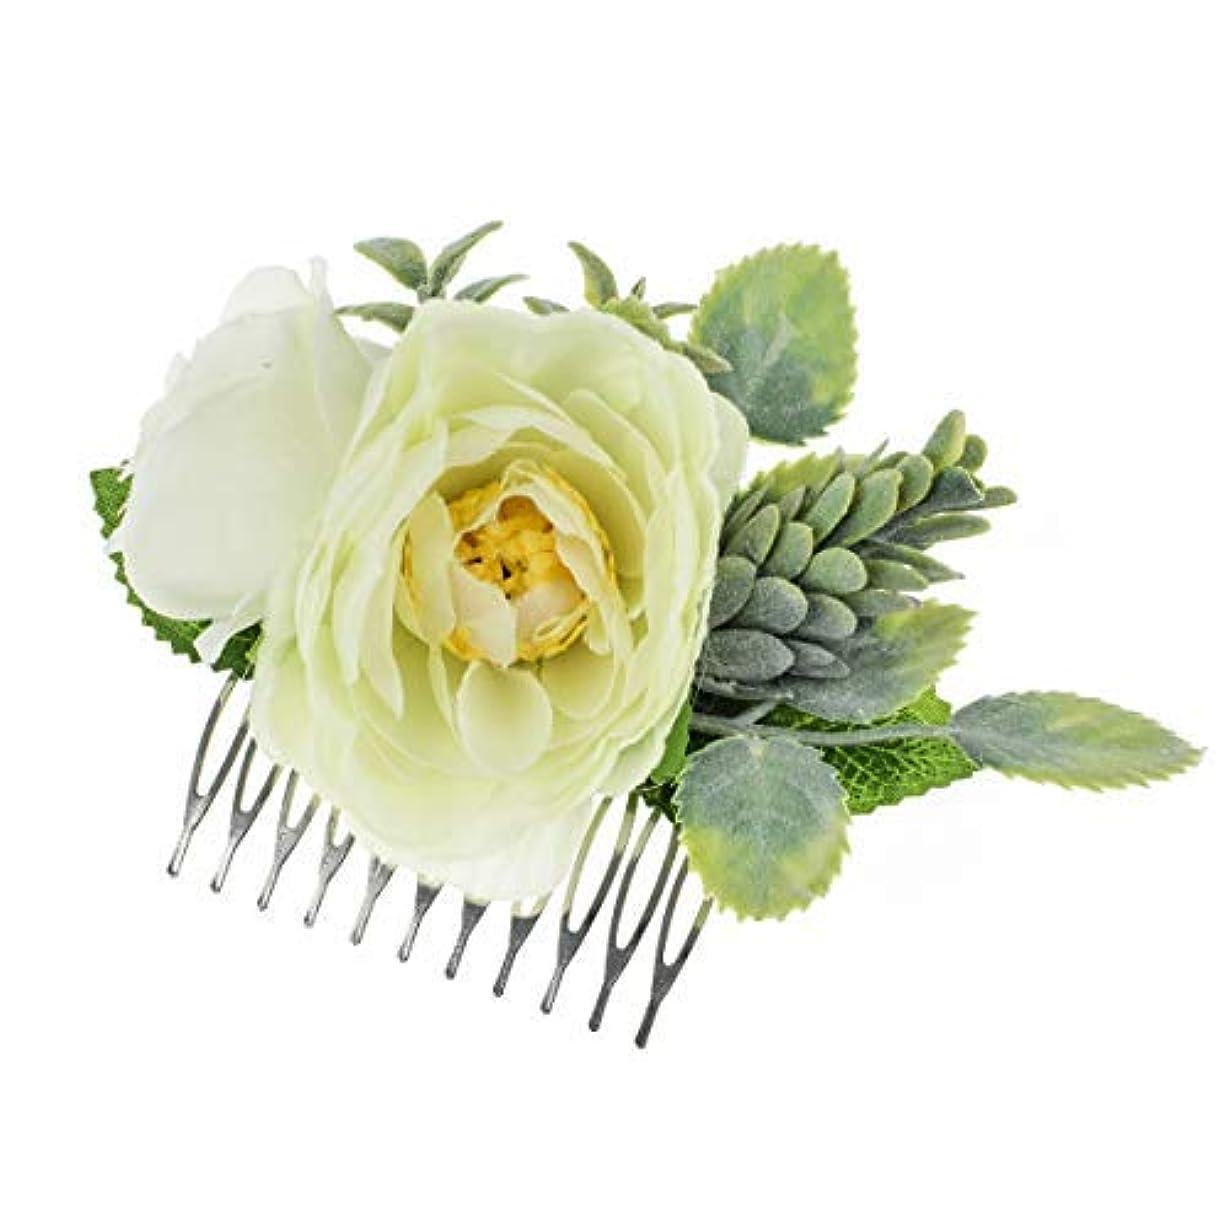 Vividsun Bridal Flower Comb Greenery Hair Comb Wedding Floral Headpiece [並行輸入品]